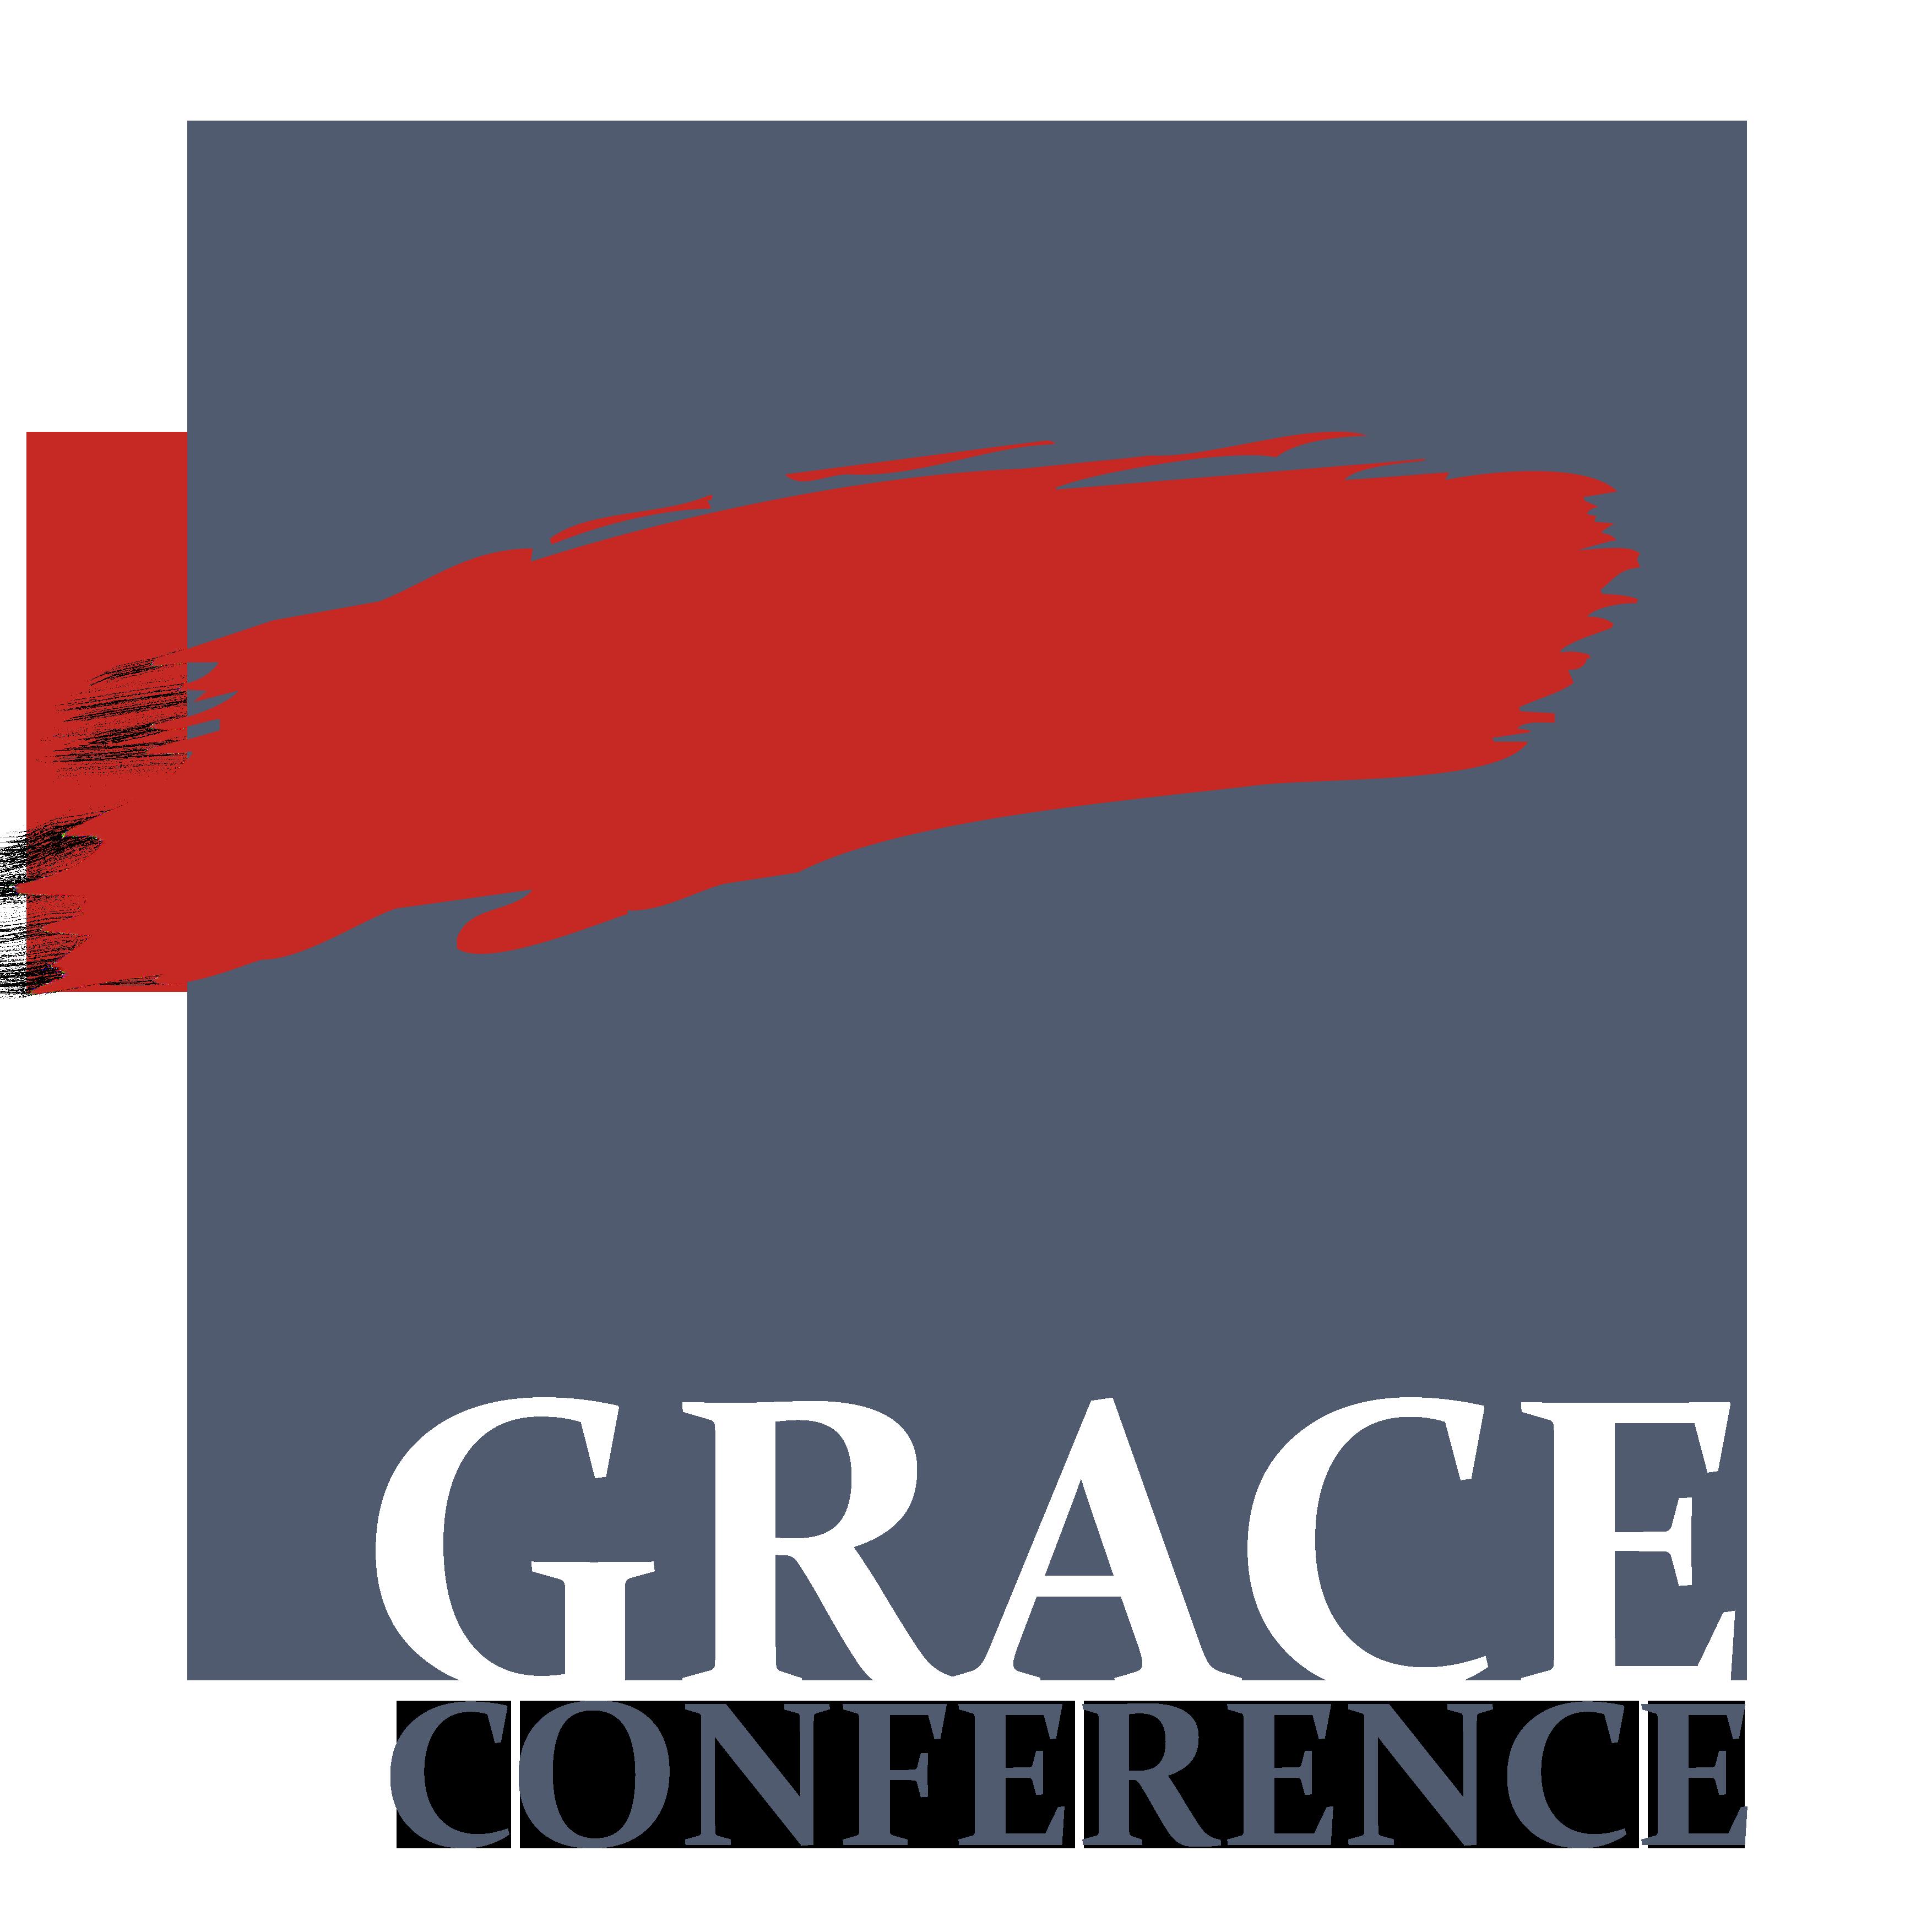 Grace Conference